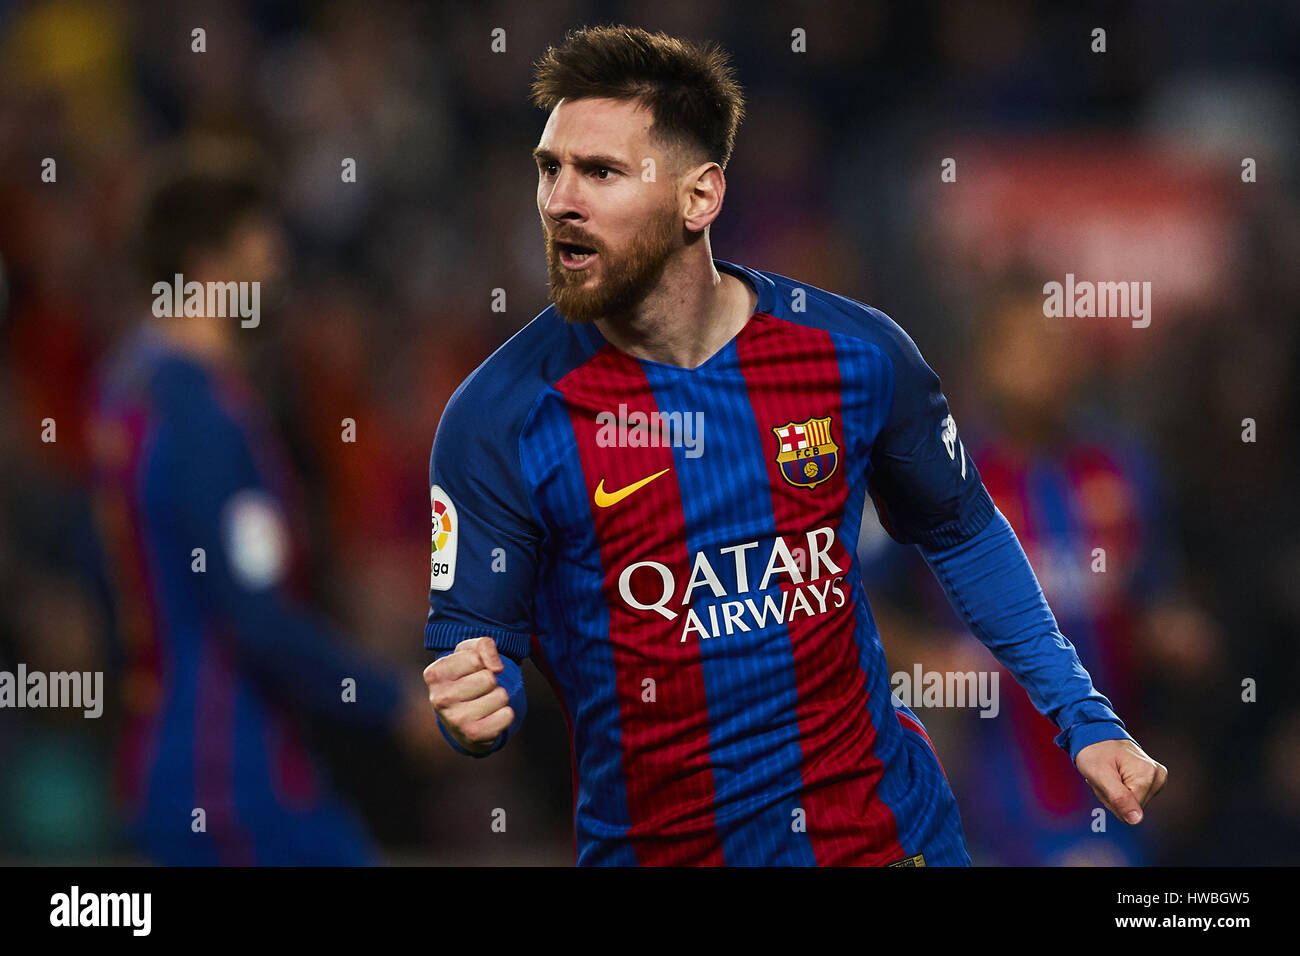 Barcelona, Spain. 19th Mar, 2017. Lionel Messi (FC Barcelona) celebrates after scoring, during La Liga football - Stock Image